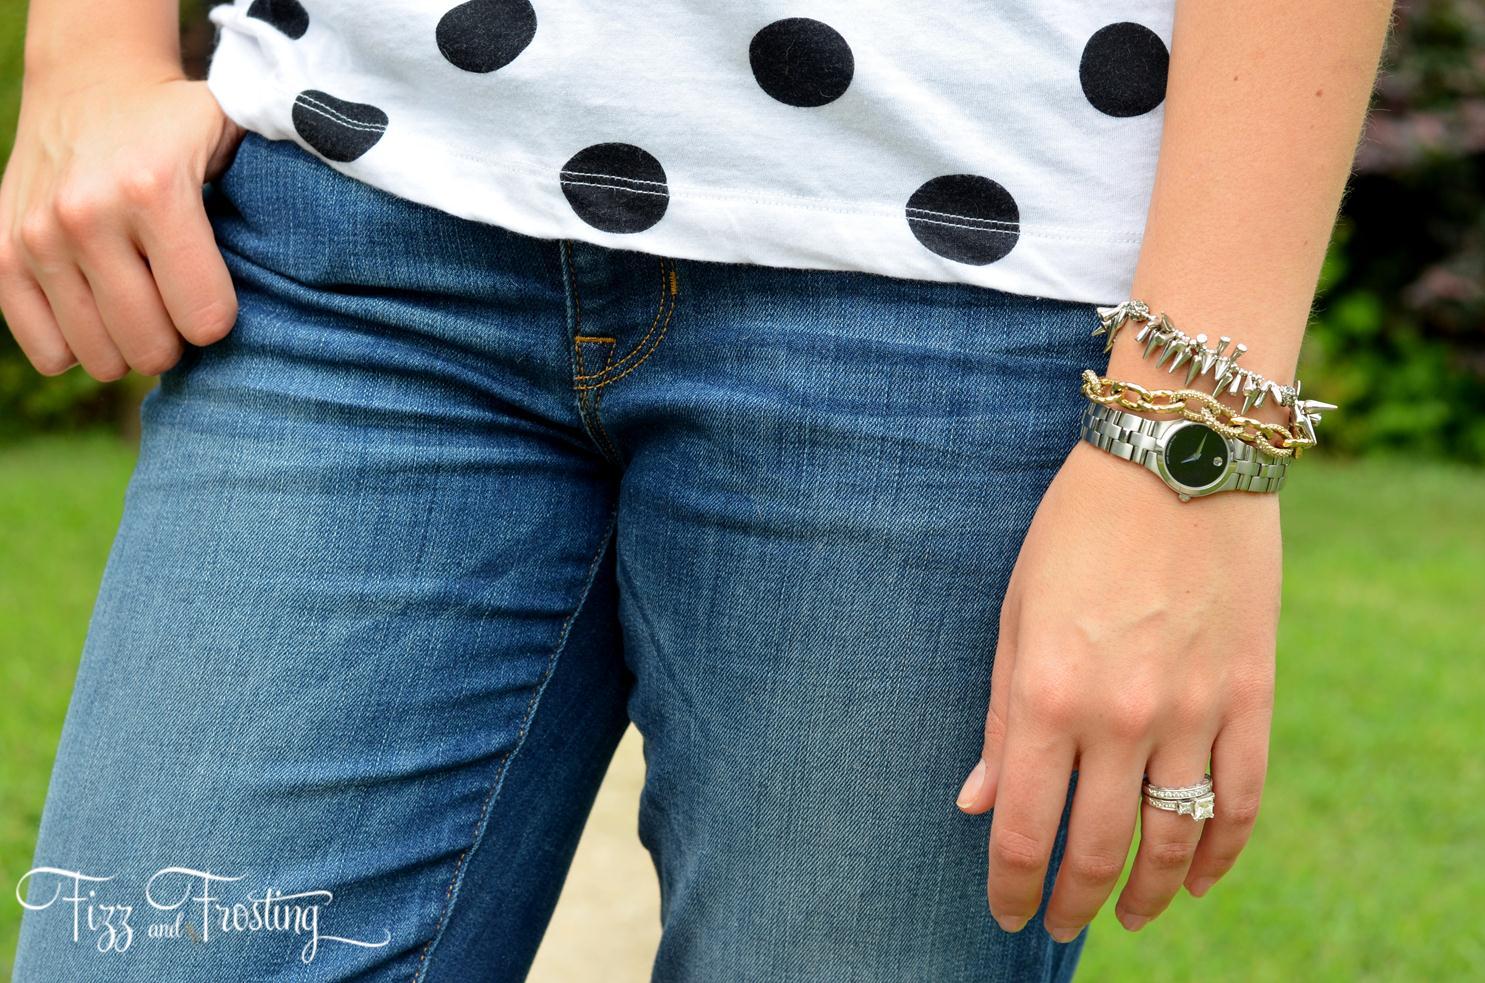 Mix Gold And Silver Bracelets .